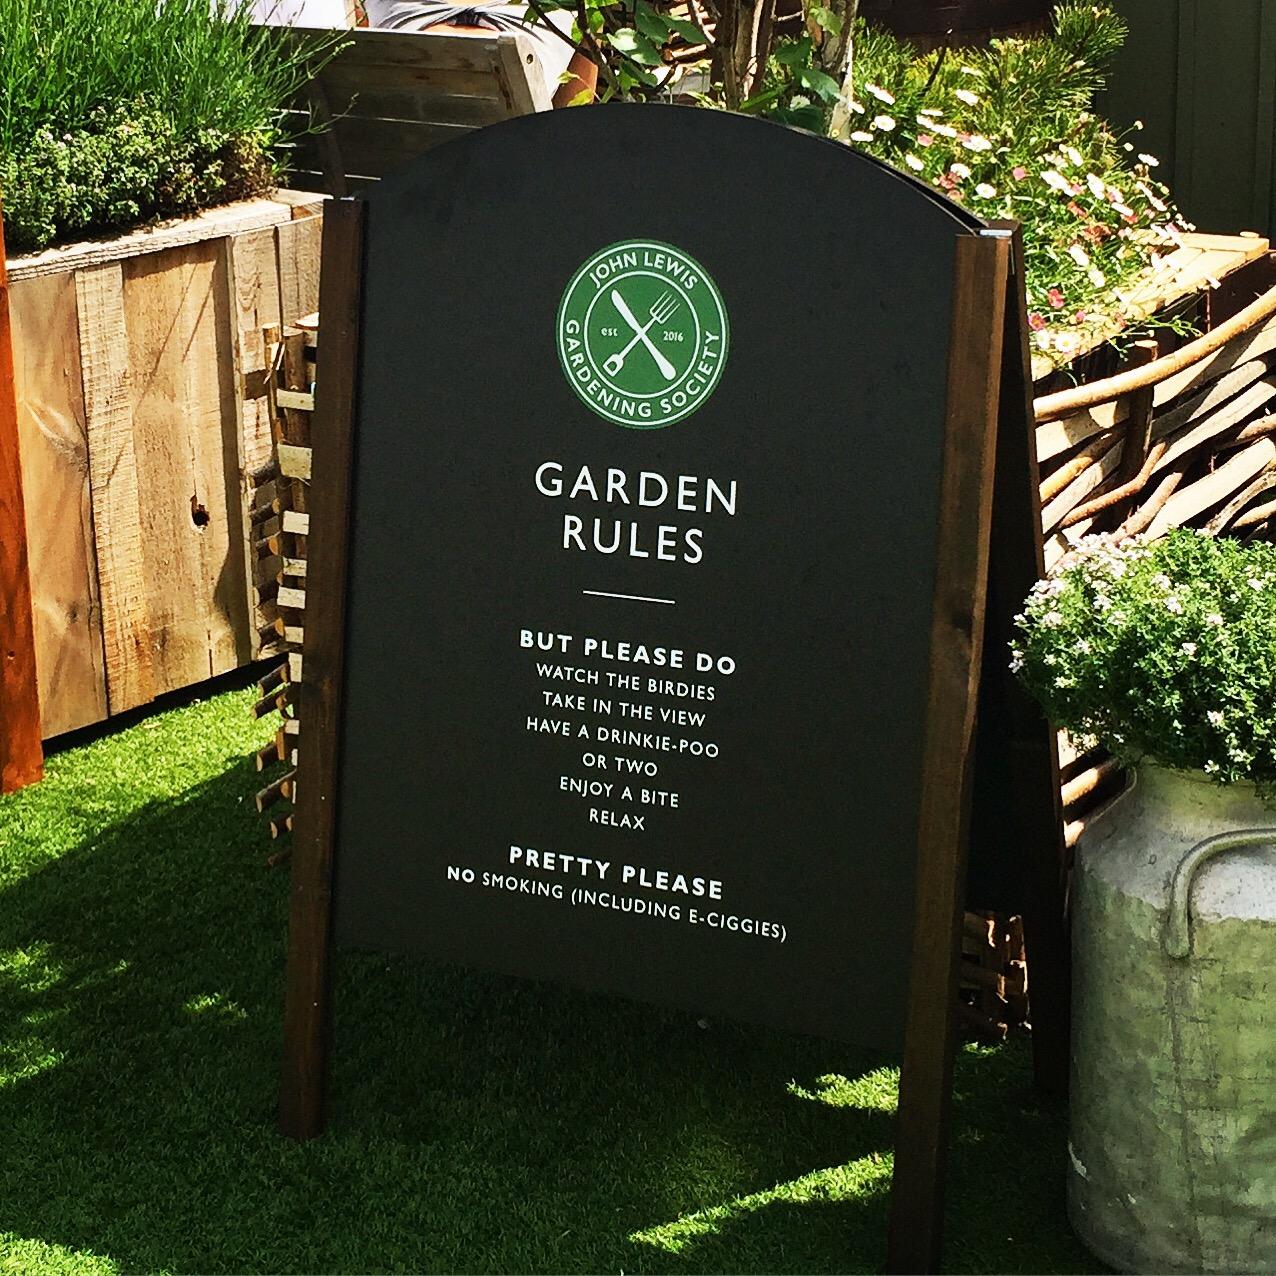 Garden Sheds John Lewis do! john lewis gardening society – the london checklist